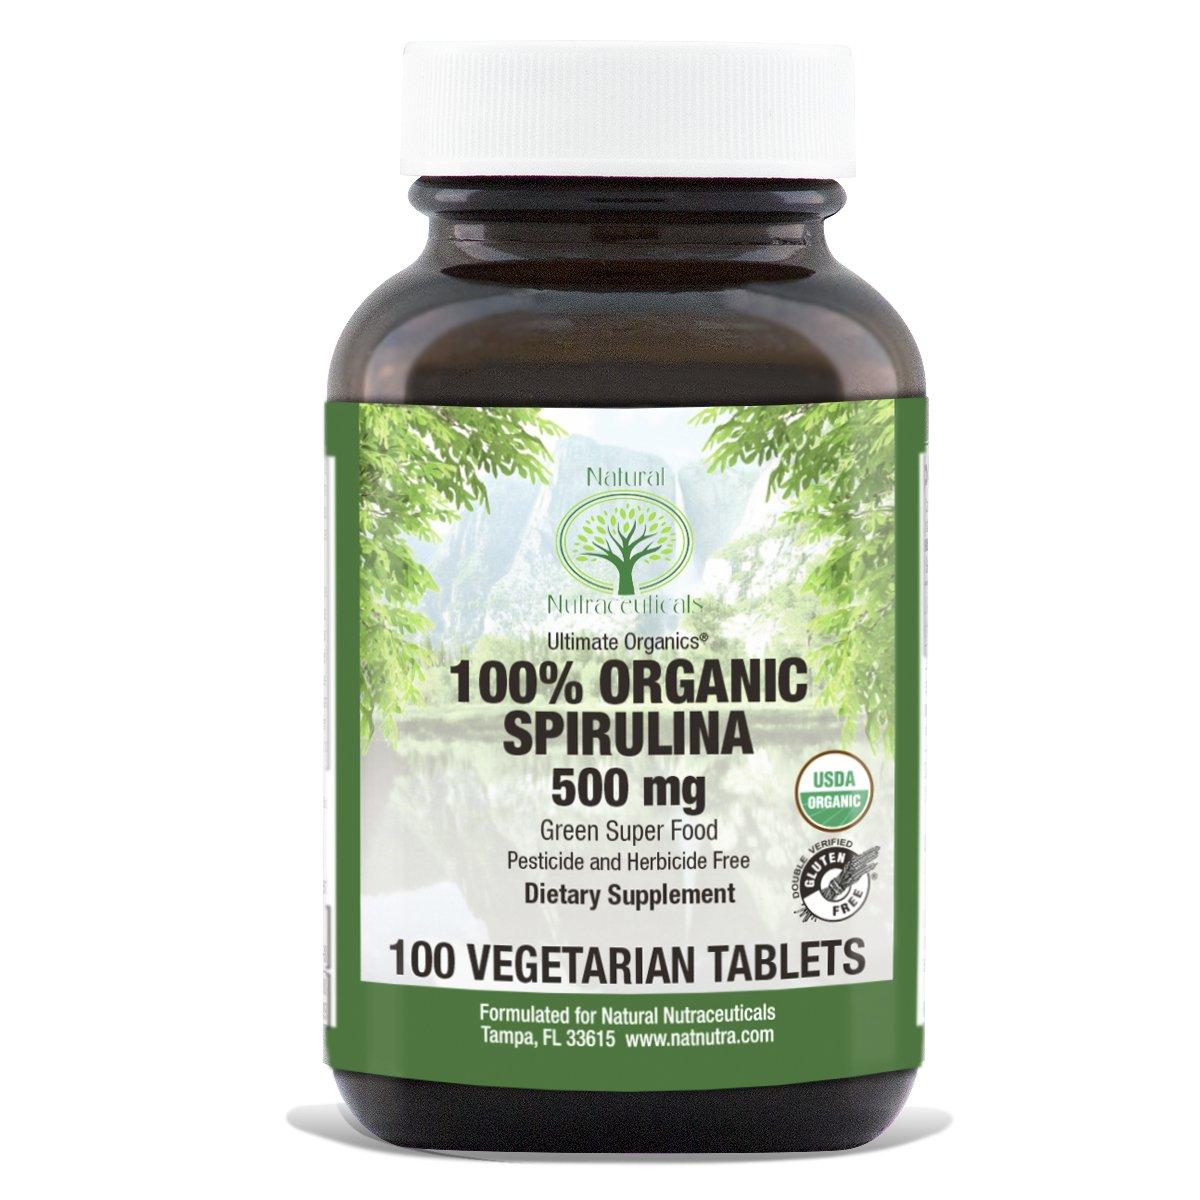 Natural Nutra Organic Spirulina Supplement with Vegan Protein, Antioxidants, Algae Superfood, 500mg, 250 Tablets